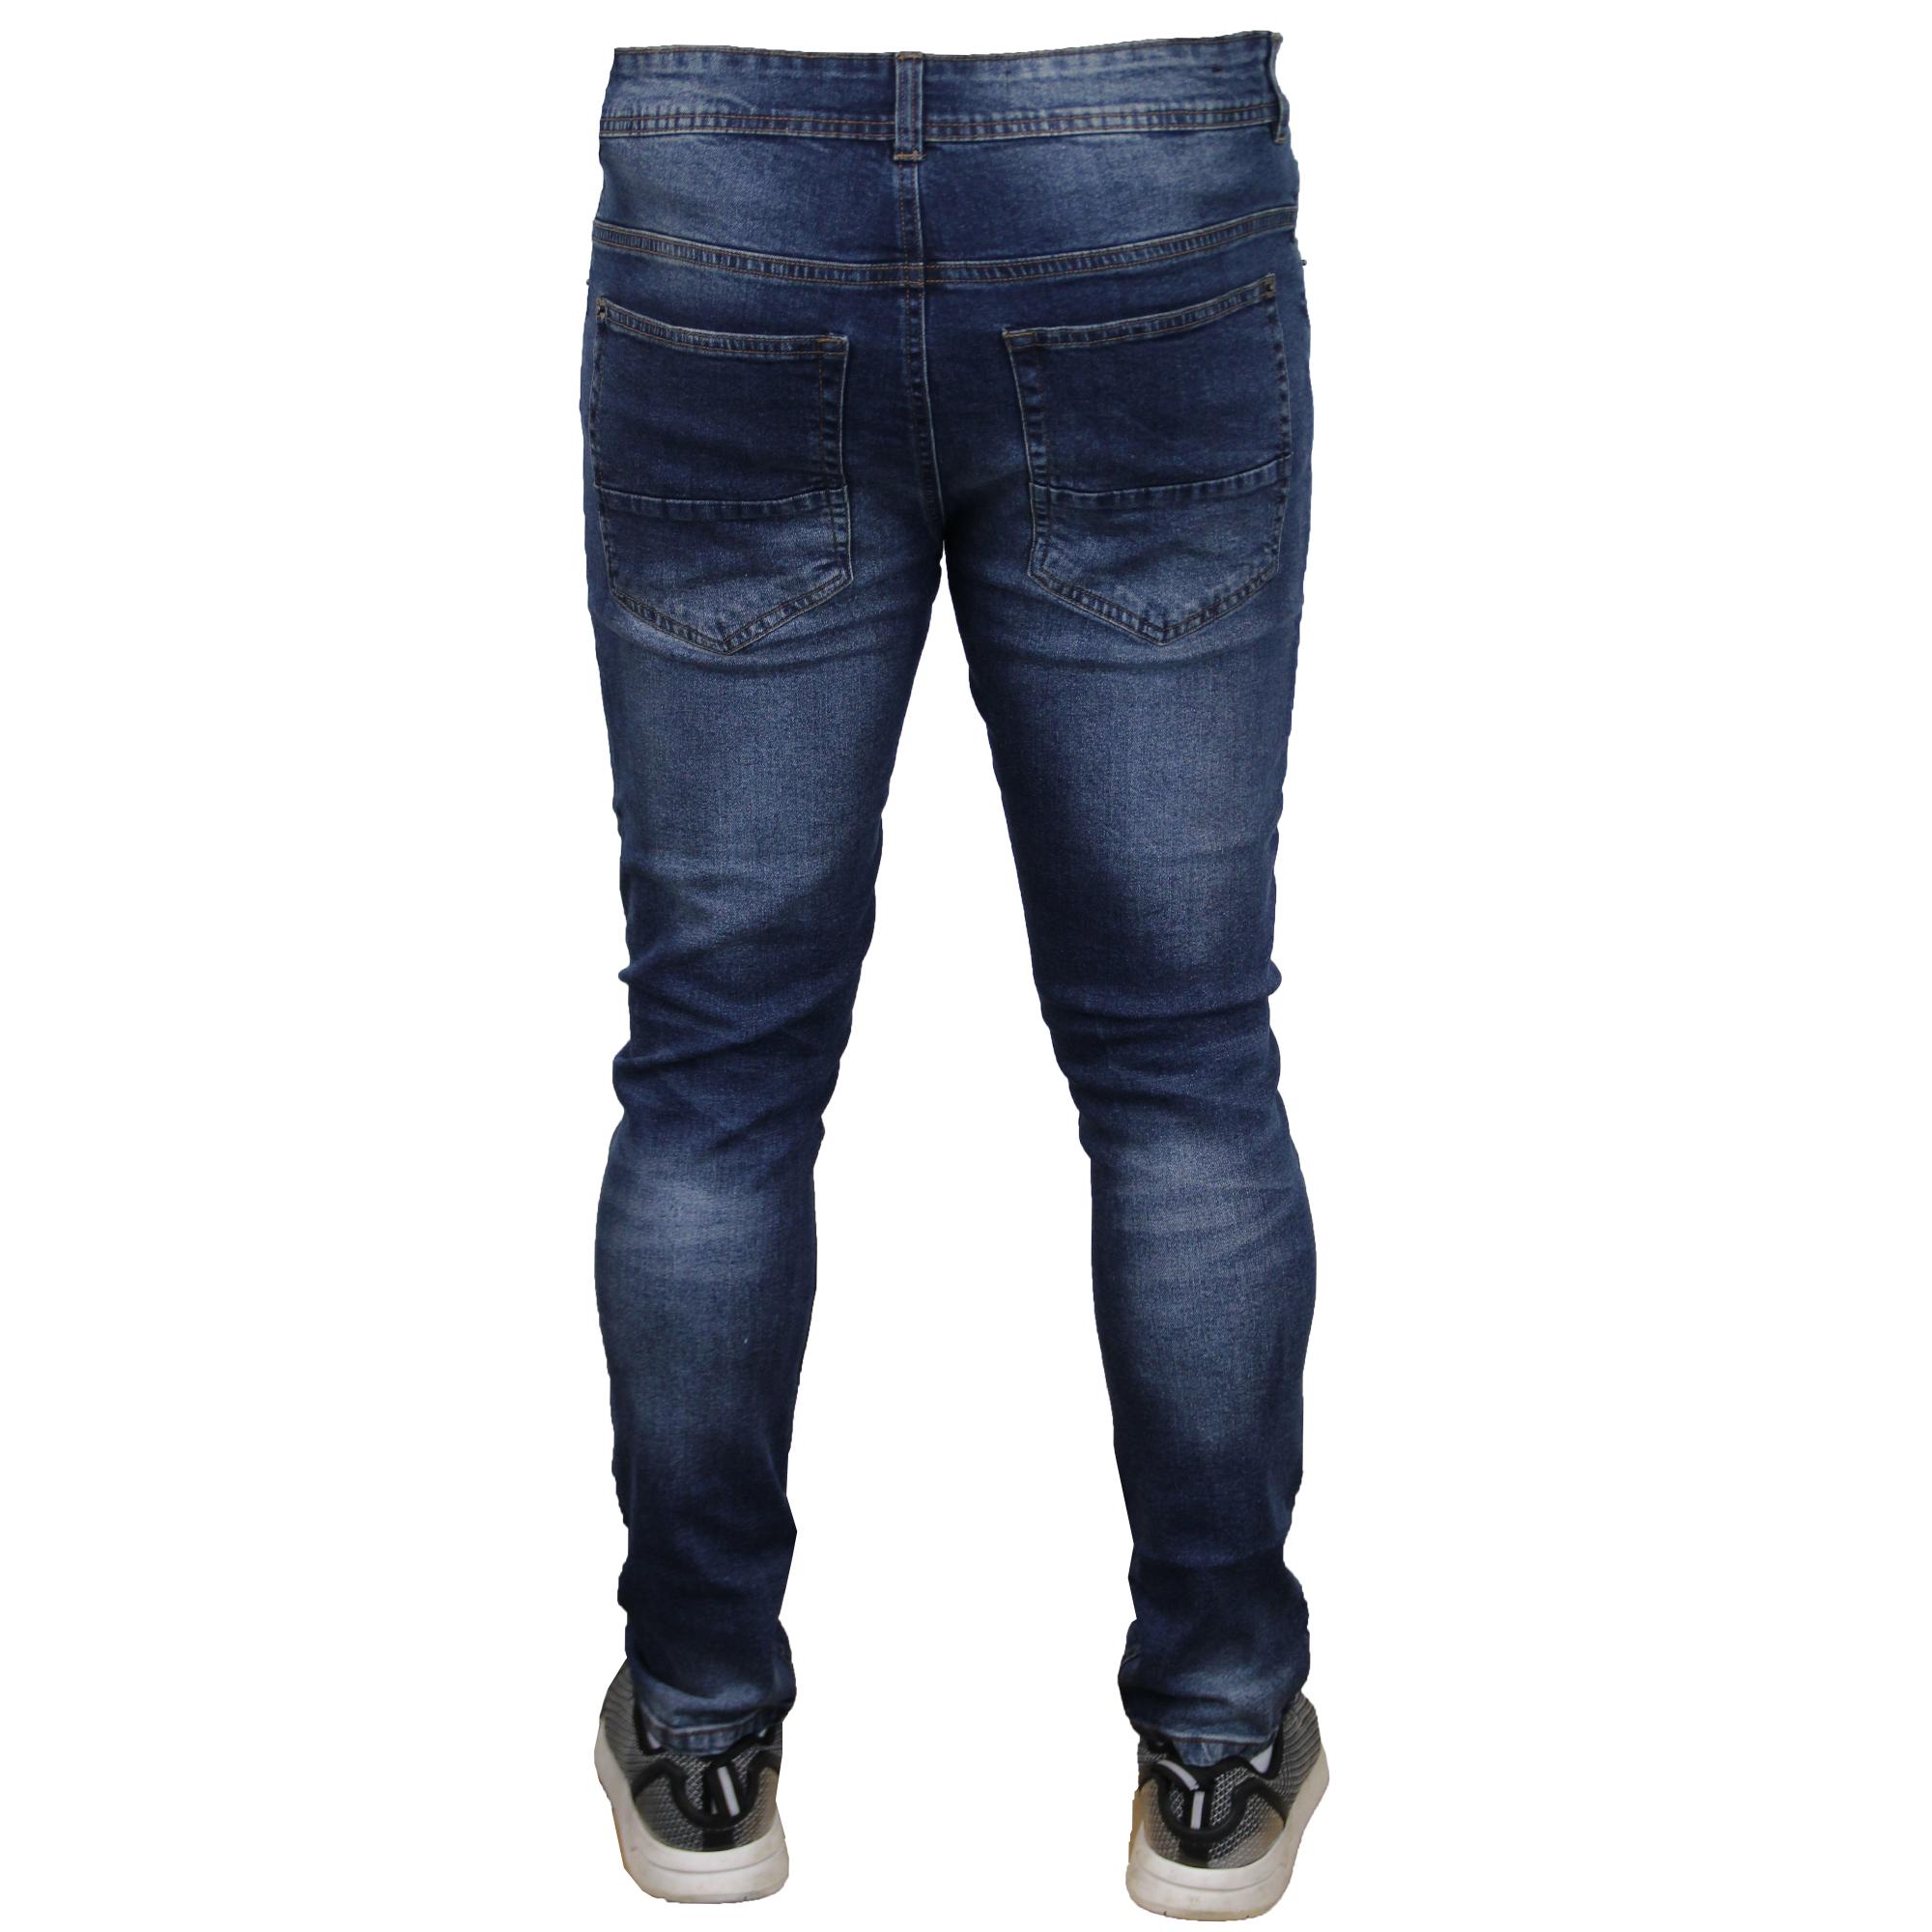 herren zerrissen jeans brave soul ortiz enge passform lerche stretch skinny ebay. Black Bedroom Furniture Sets. Home Design Ideas